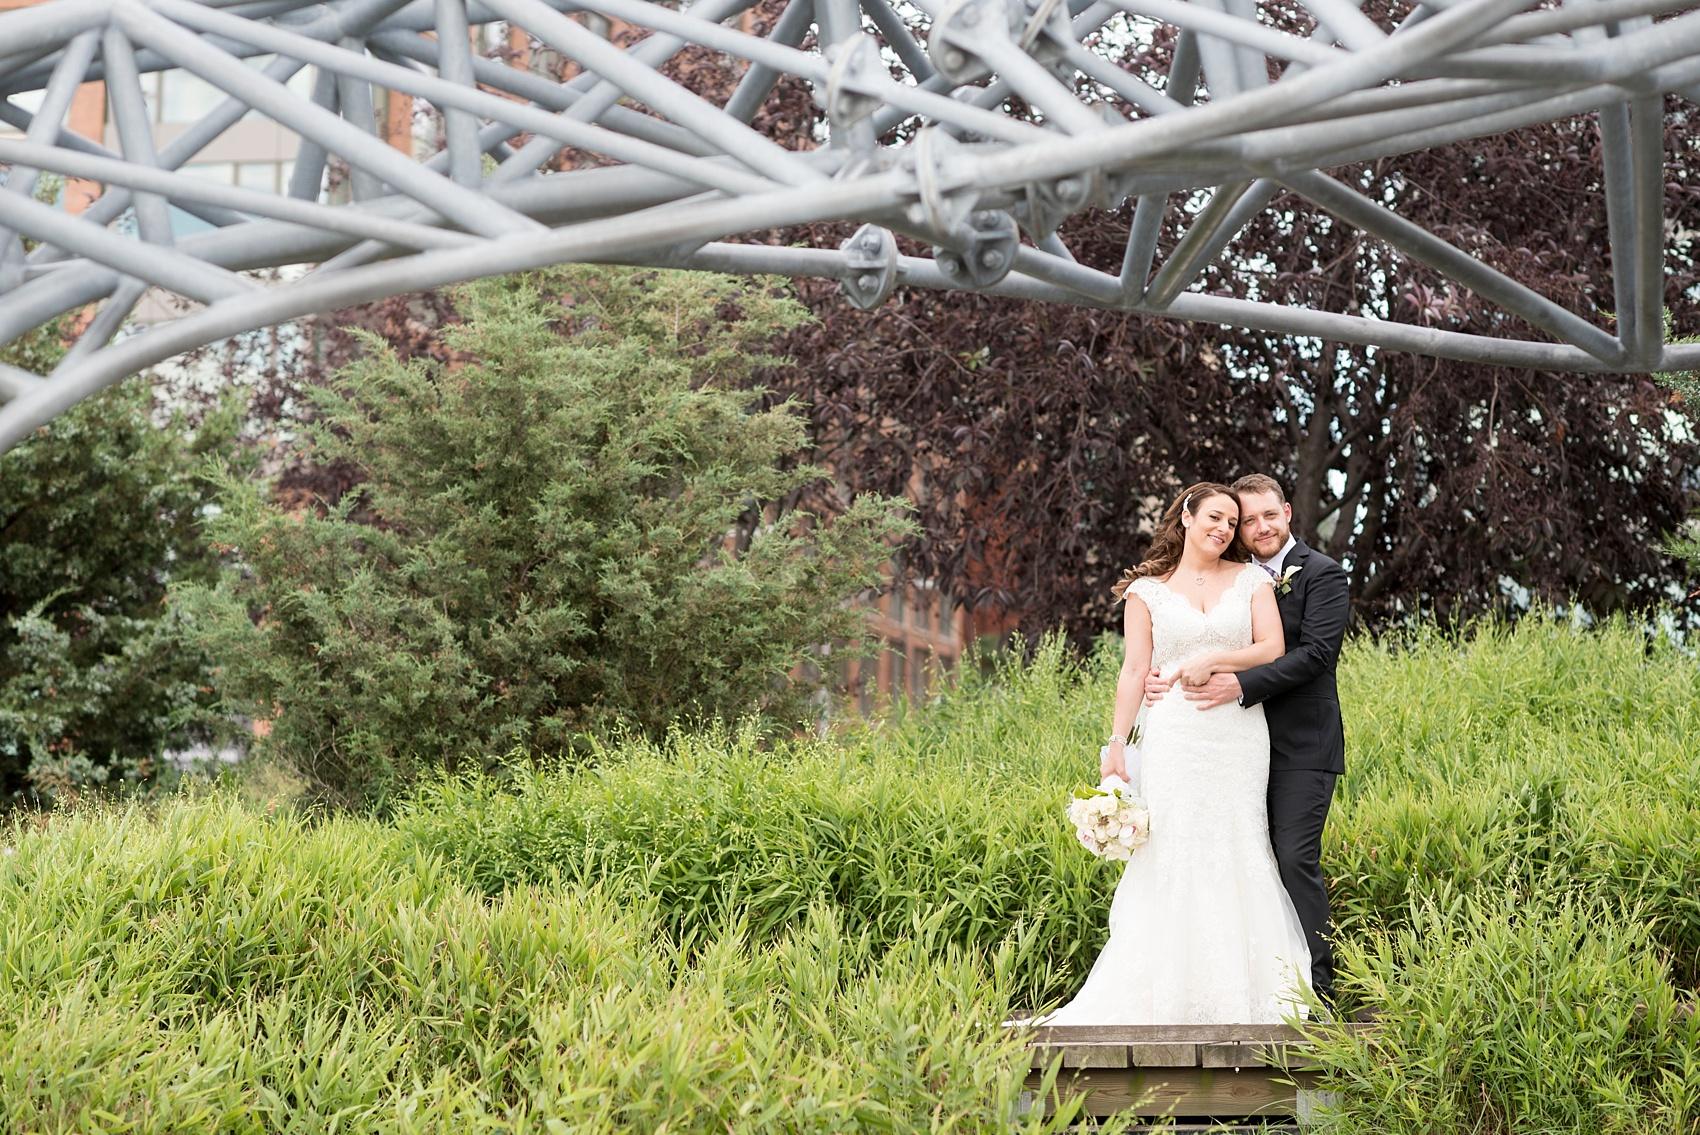 tribeca rooftop wedding photos � sneak peek bri phil